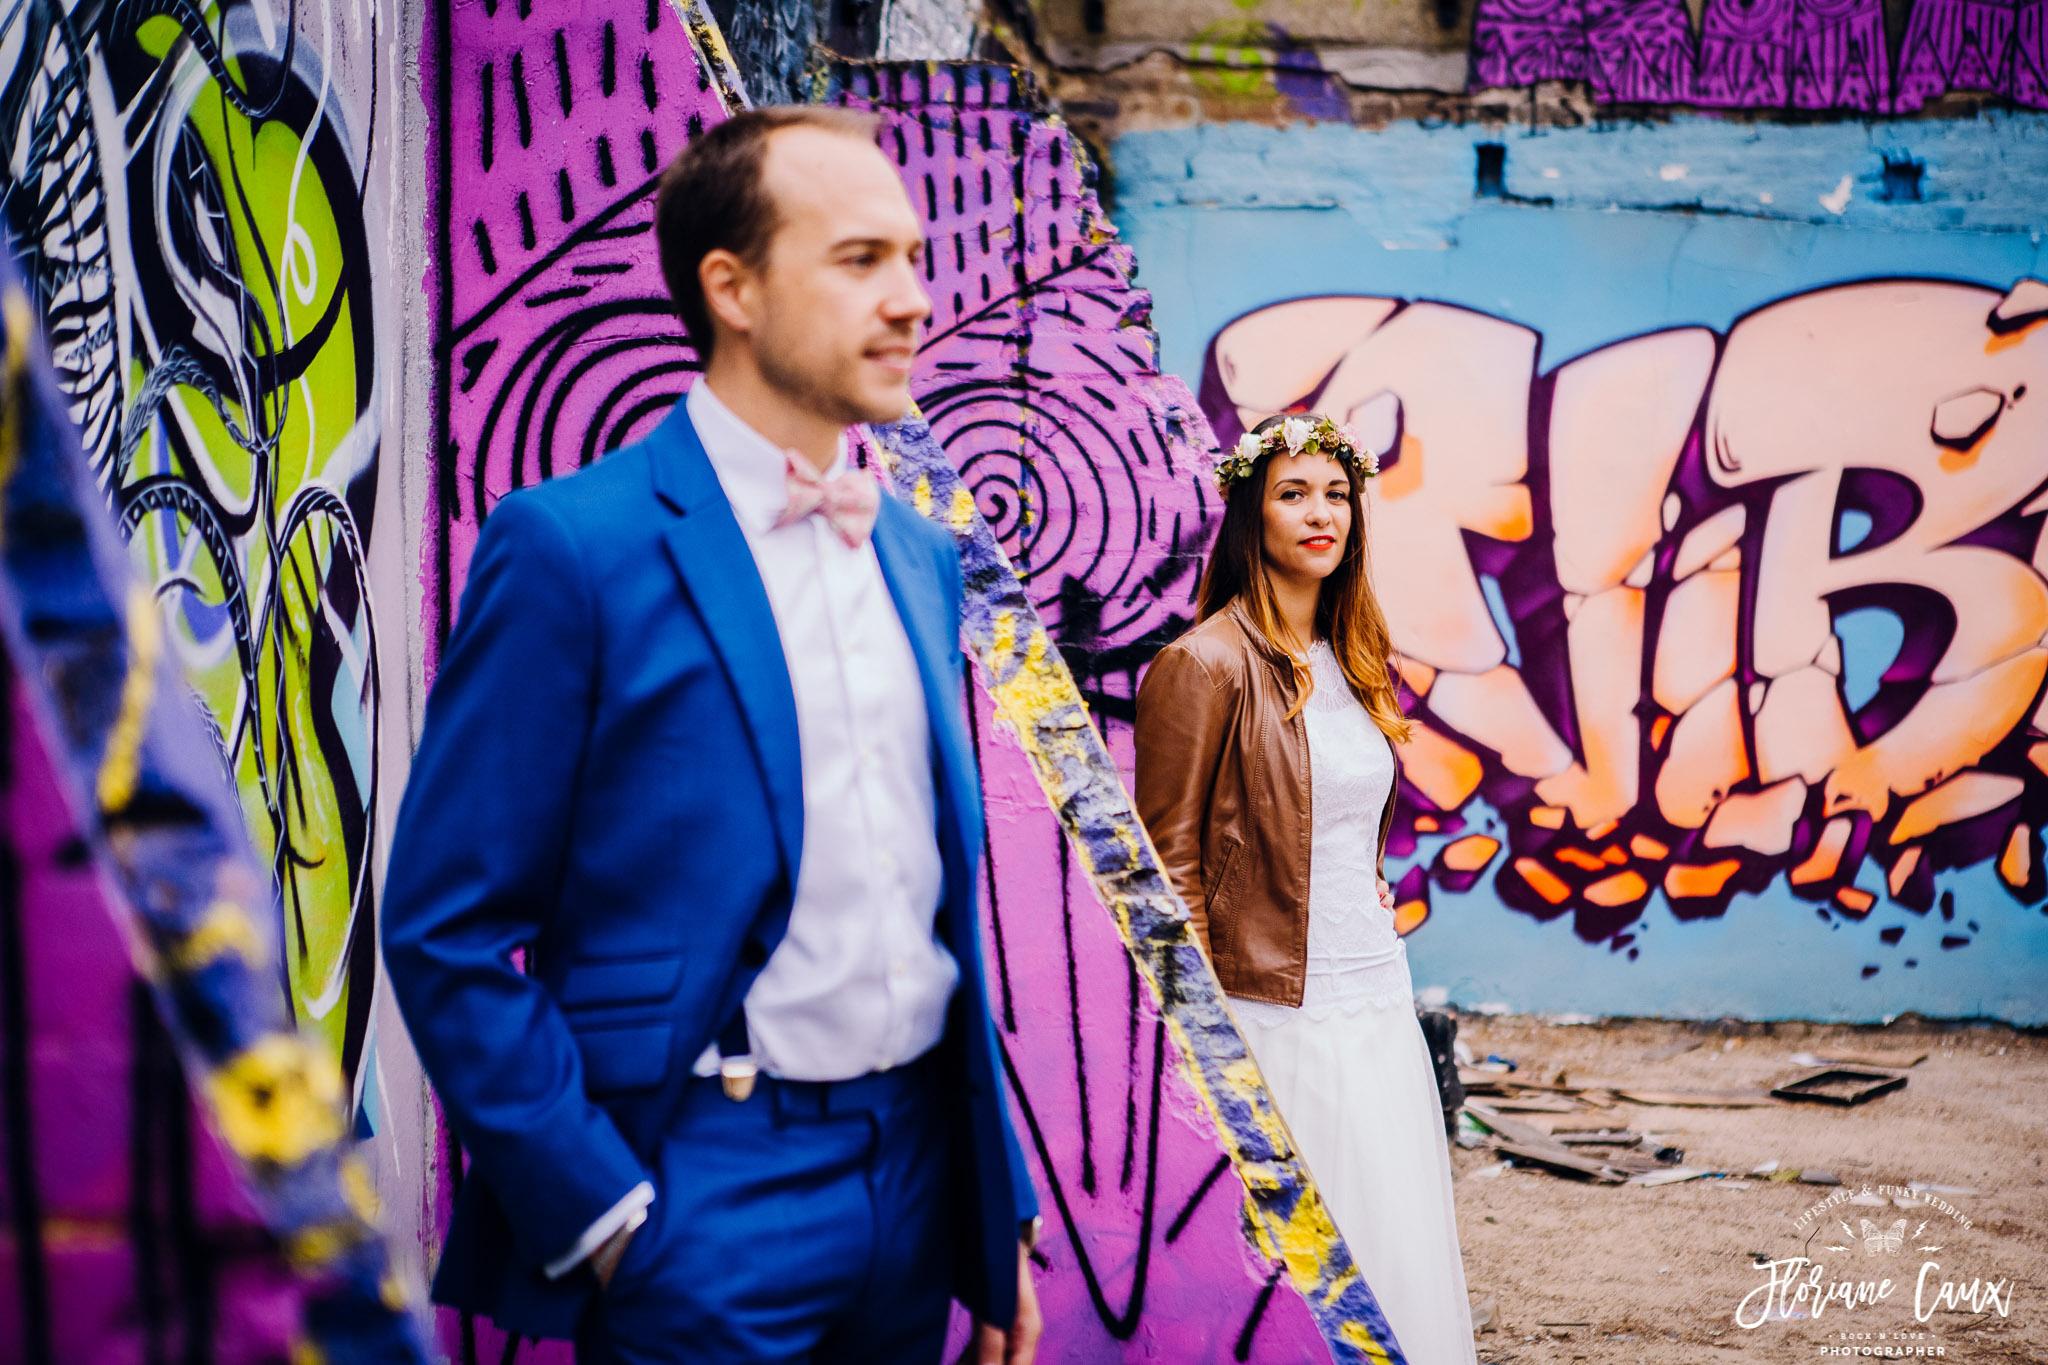 wedding photography in East London Brick Lane